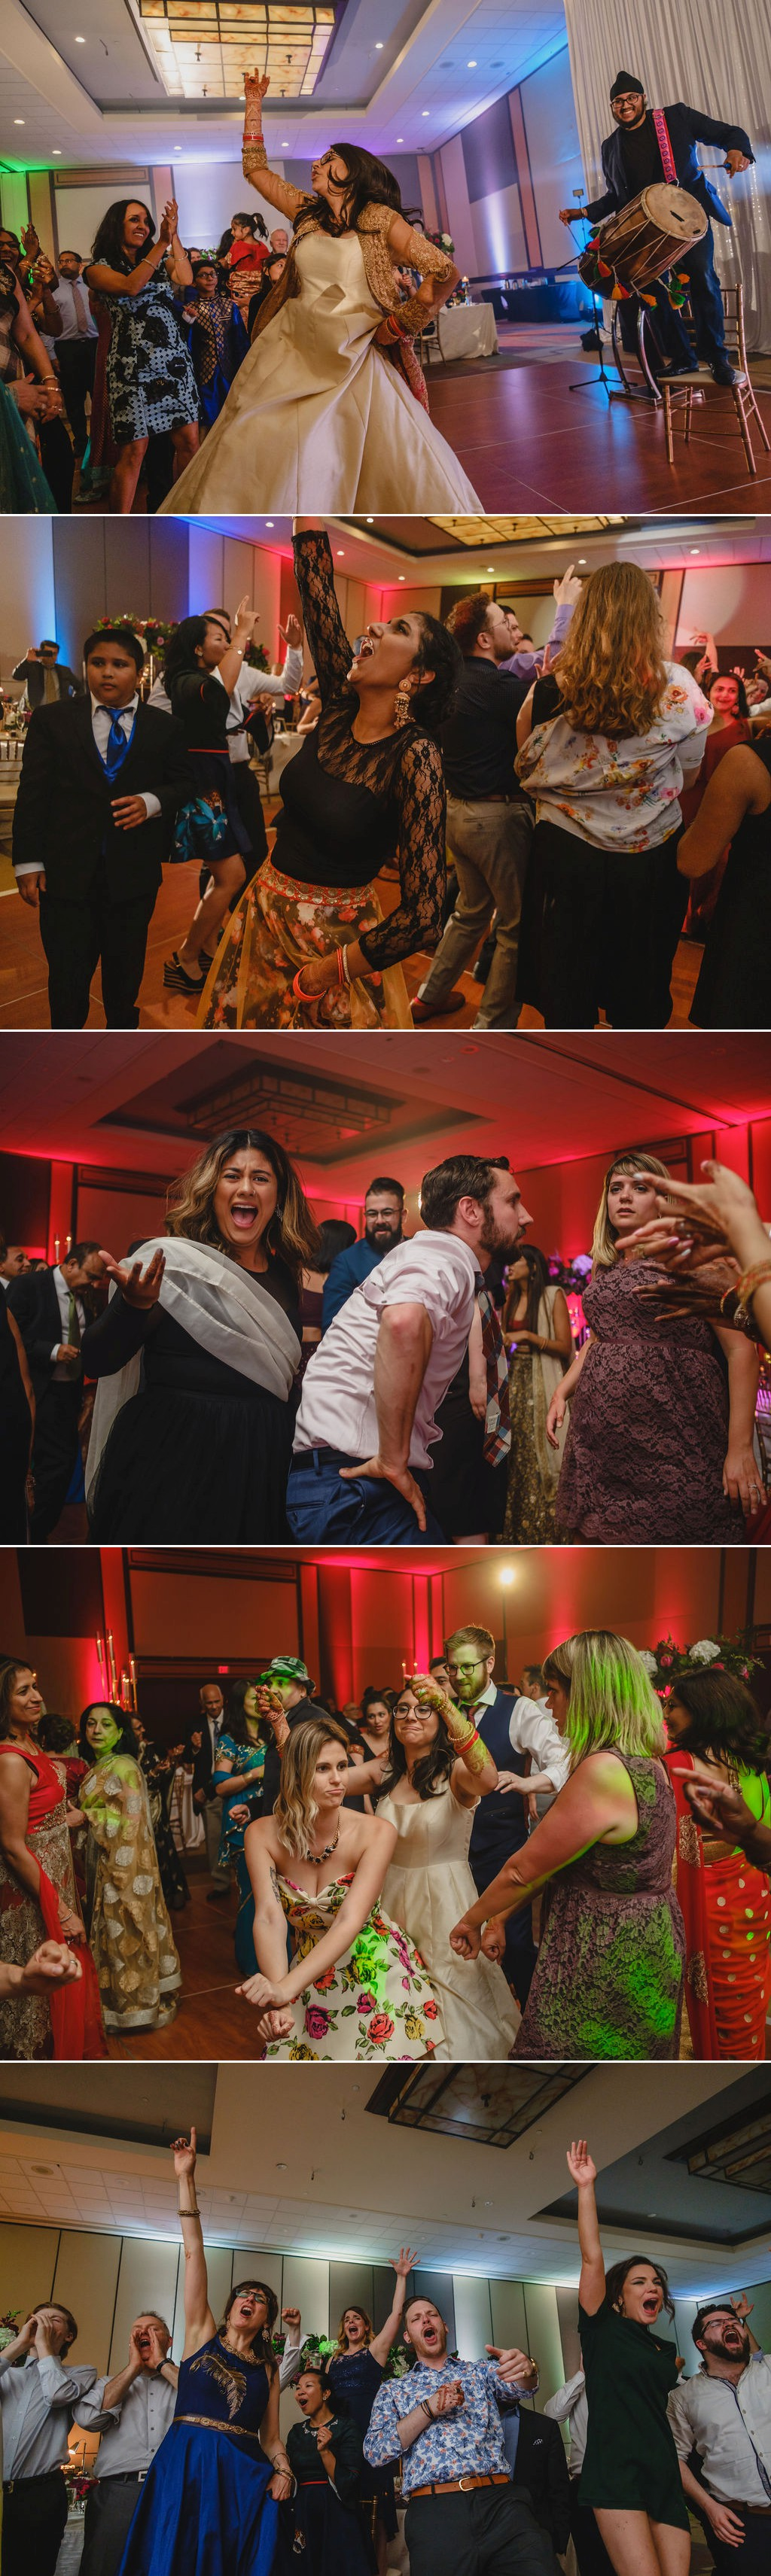 photos of dancing at a wedding reception